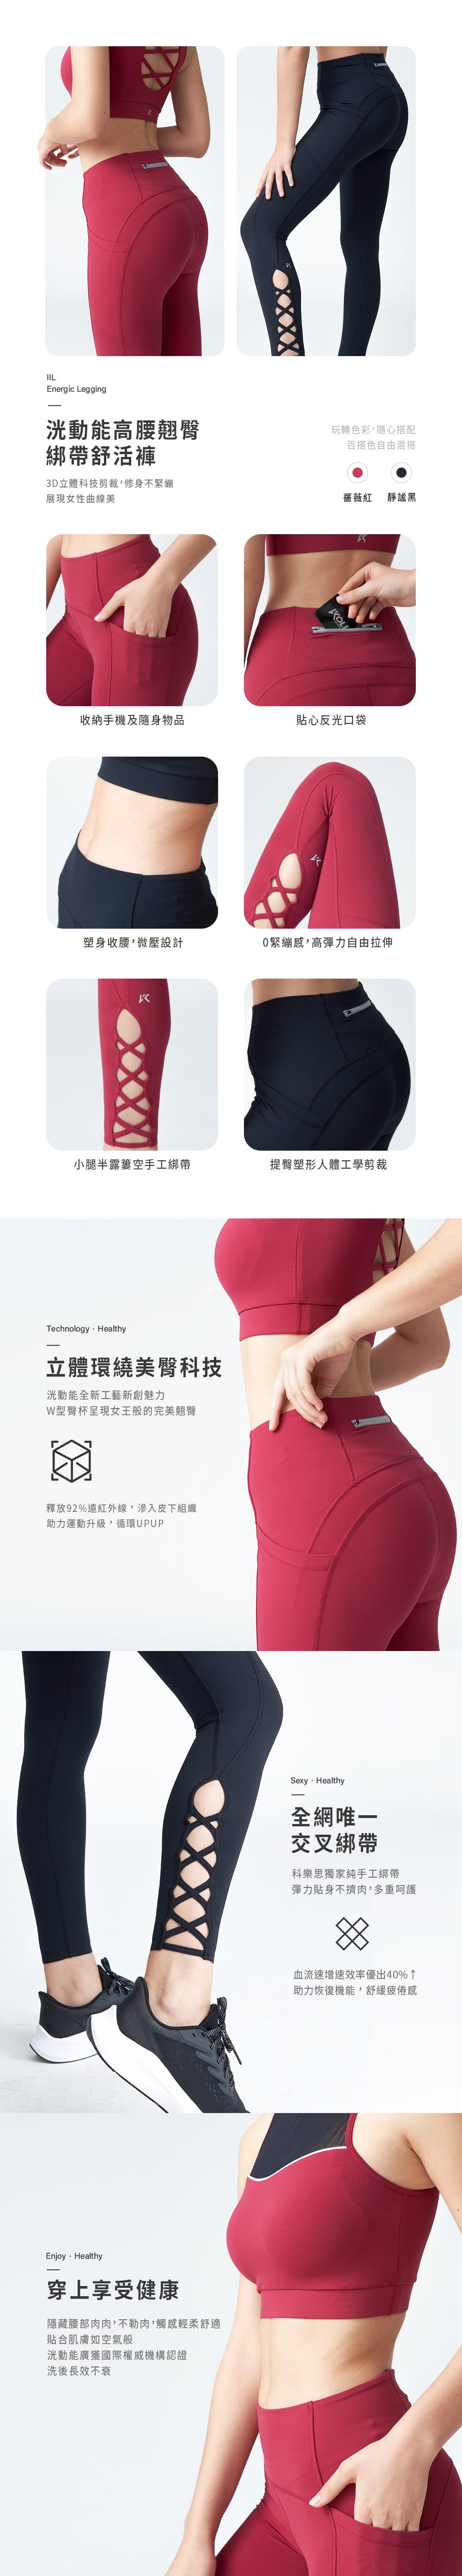 【KOLLOS科樂思】 【洸動能高腰翹臀綁帶舒活褲 遠紅外線】 薔薇紅 4